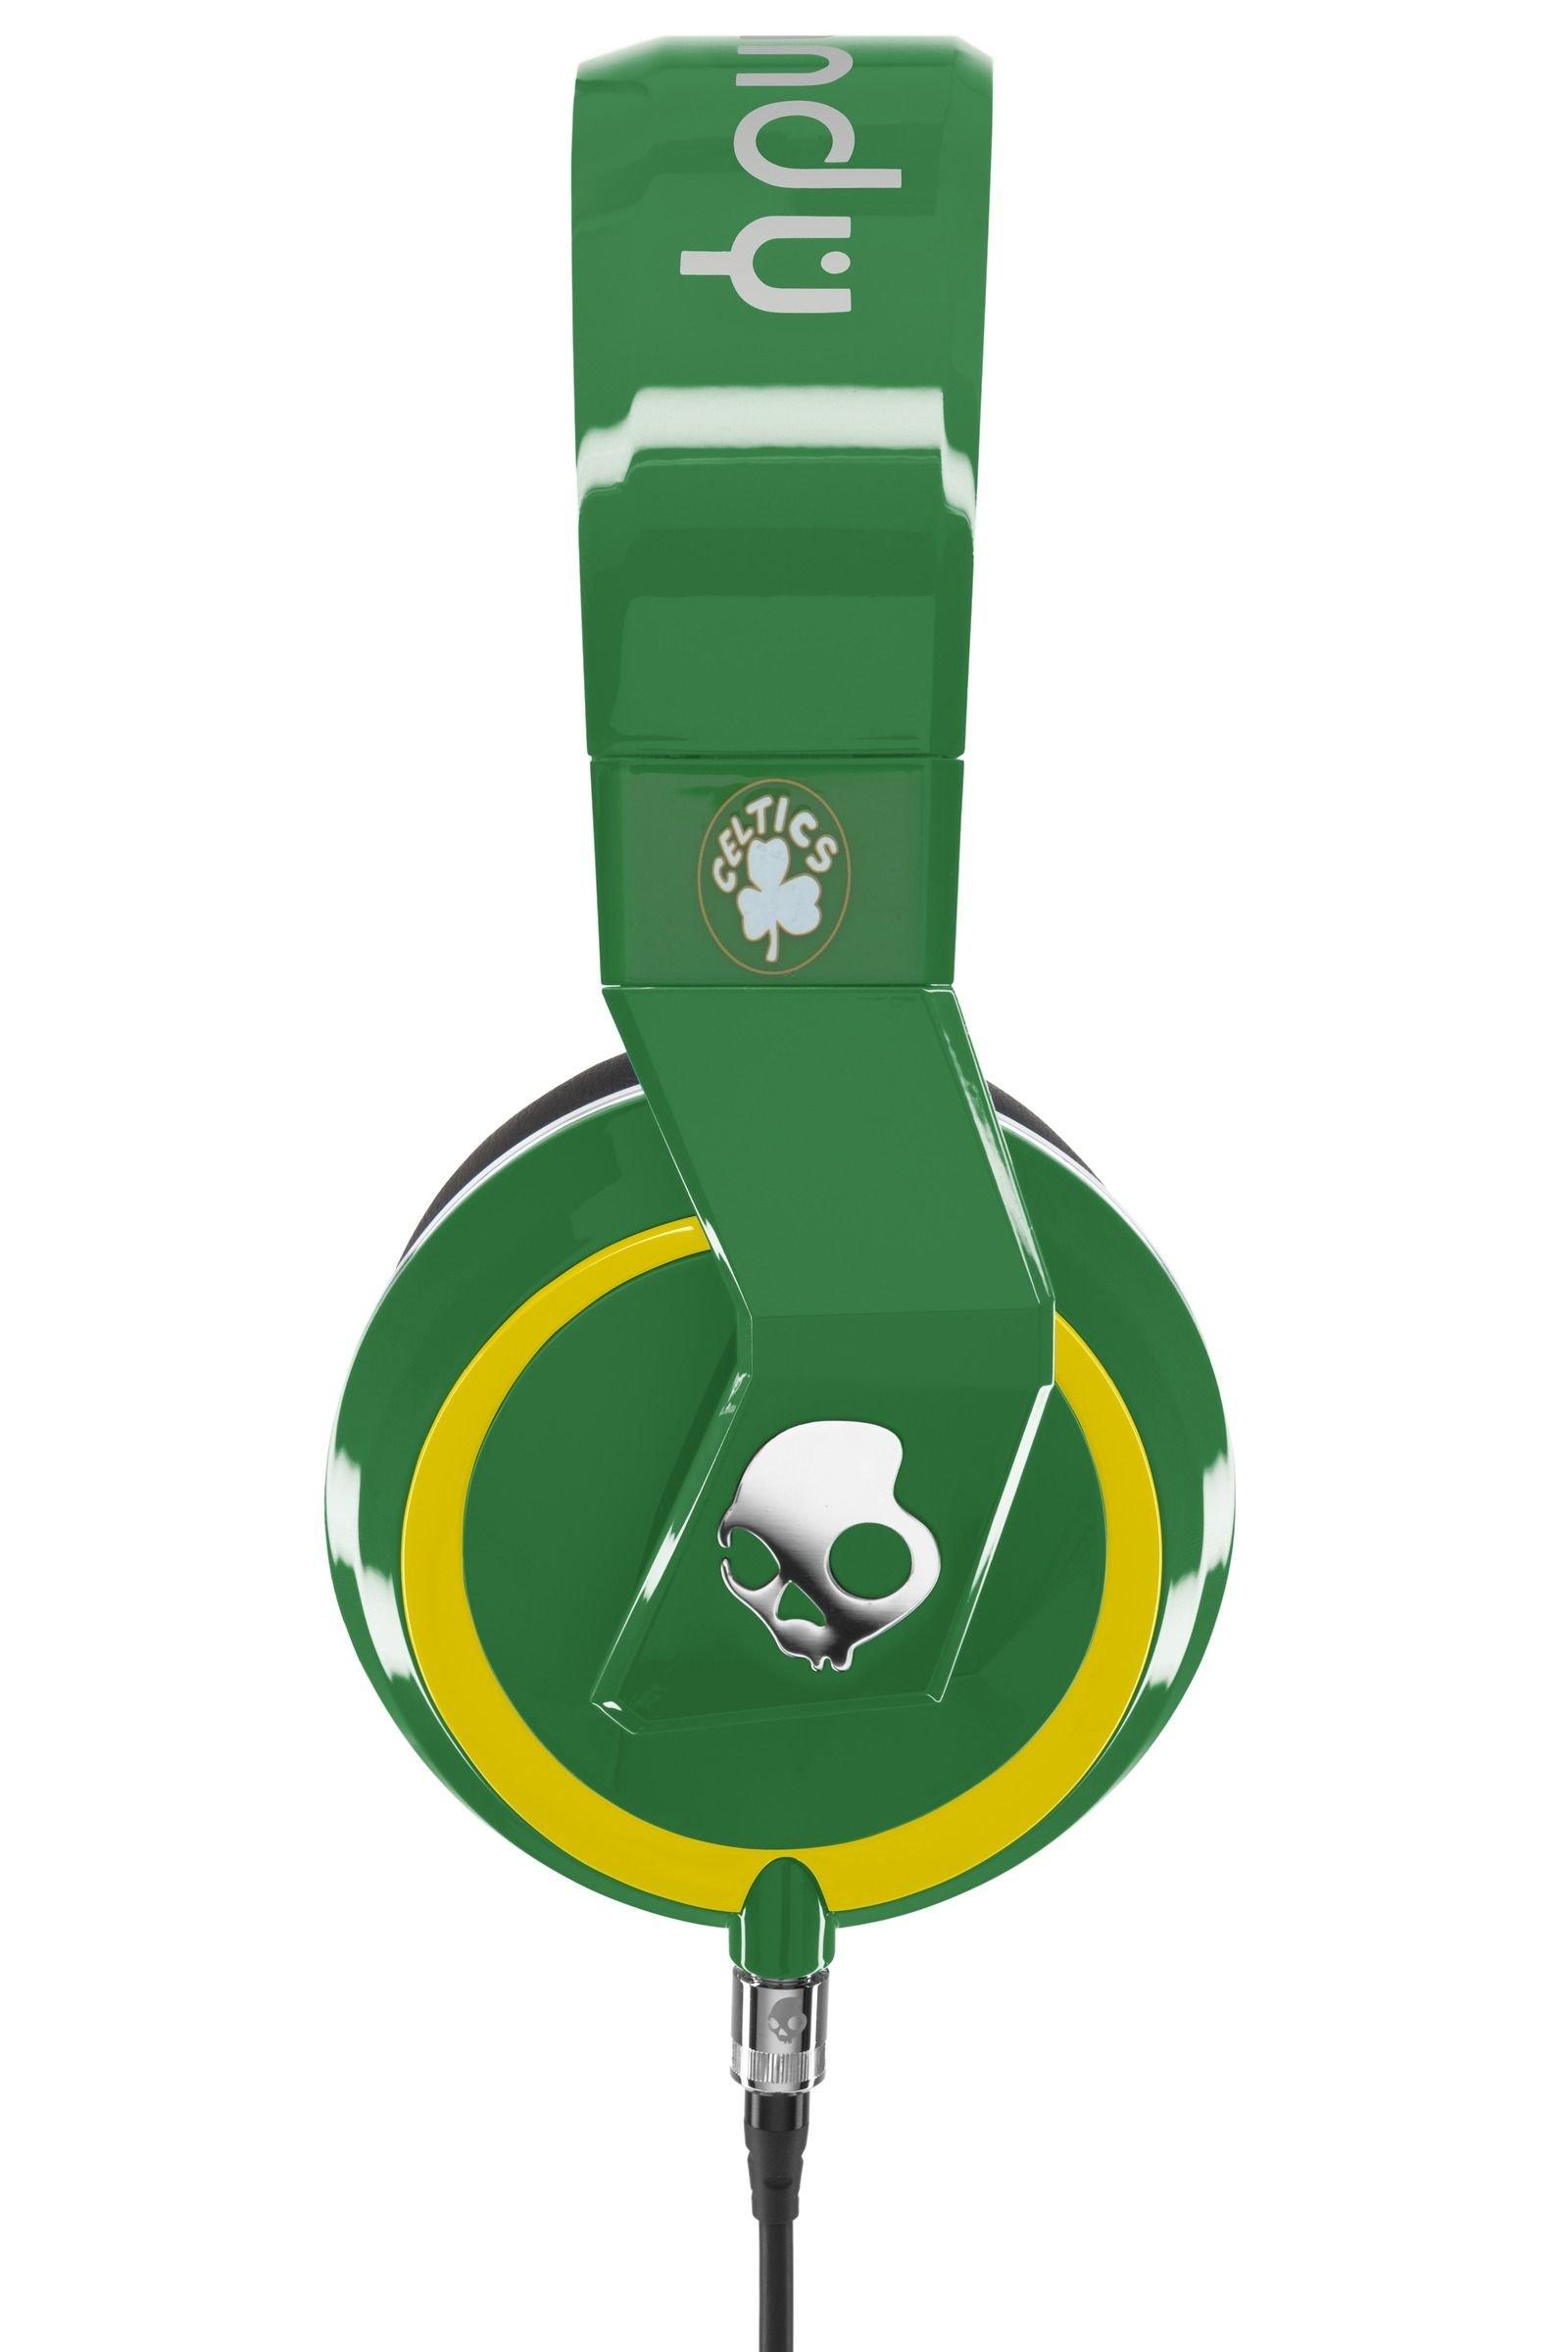 Skullcandy Mix Master Headphones with DJ Capabilities and 3 Button Mic, NBA Boston Celtics by Skullcandy (Image #2)